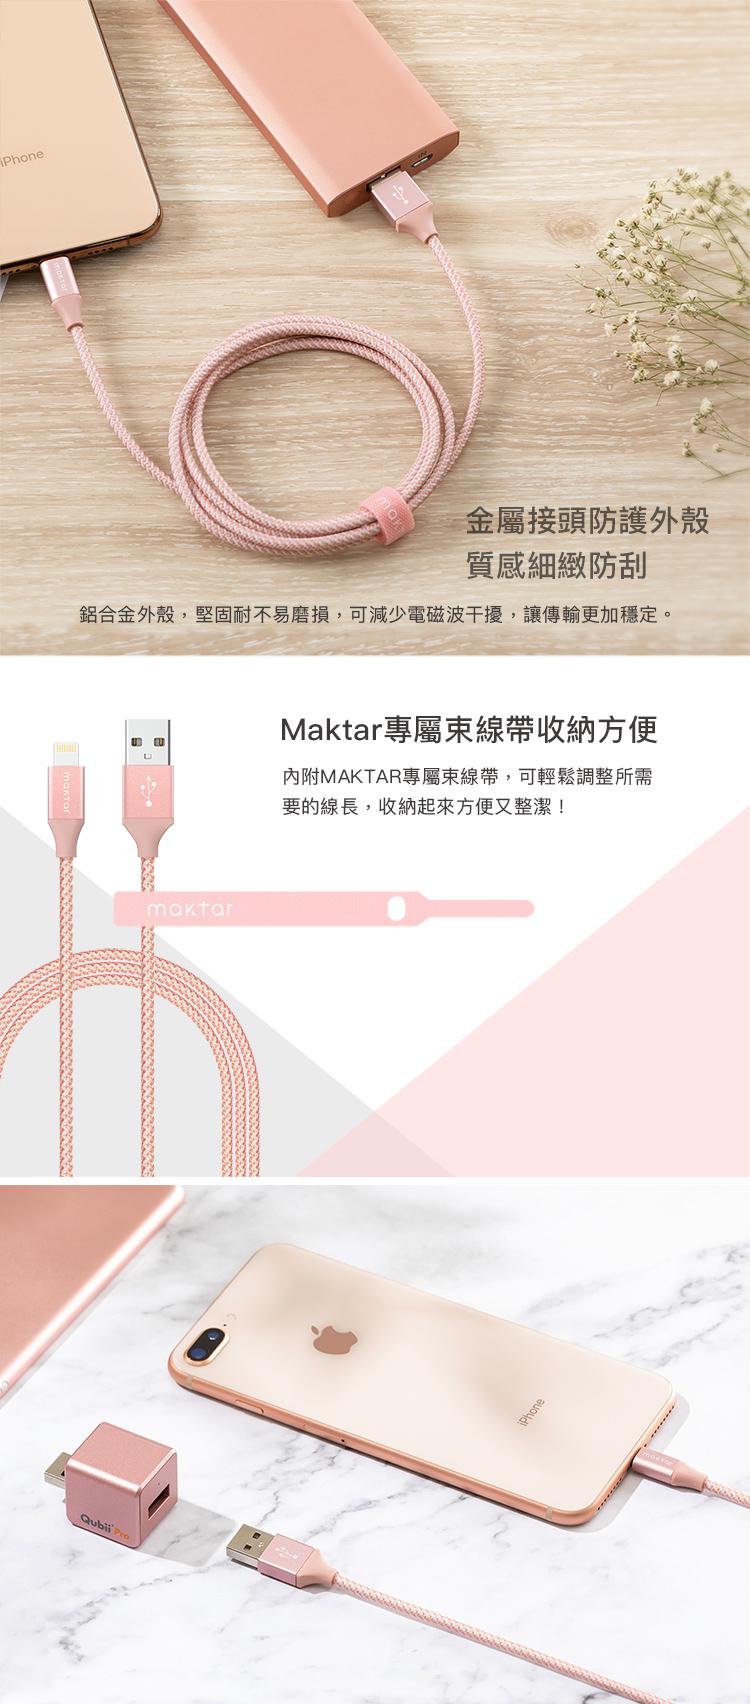 Maktar蘋果認證lightning專用傳輸充電線